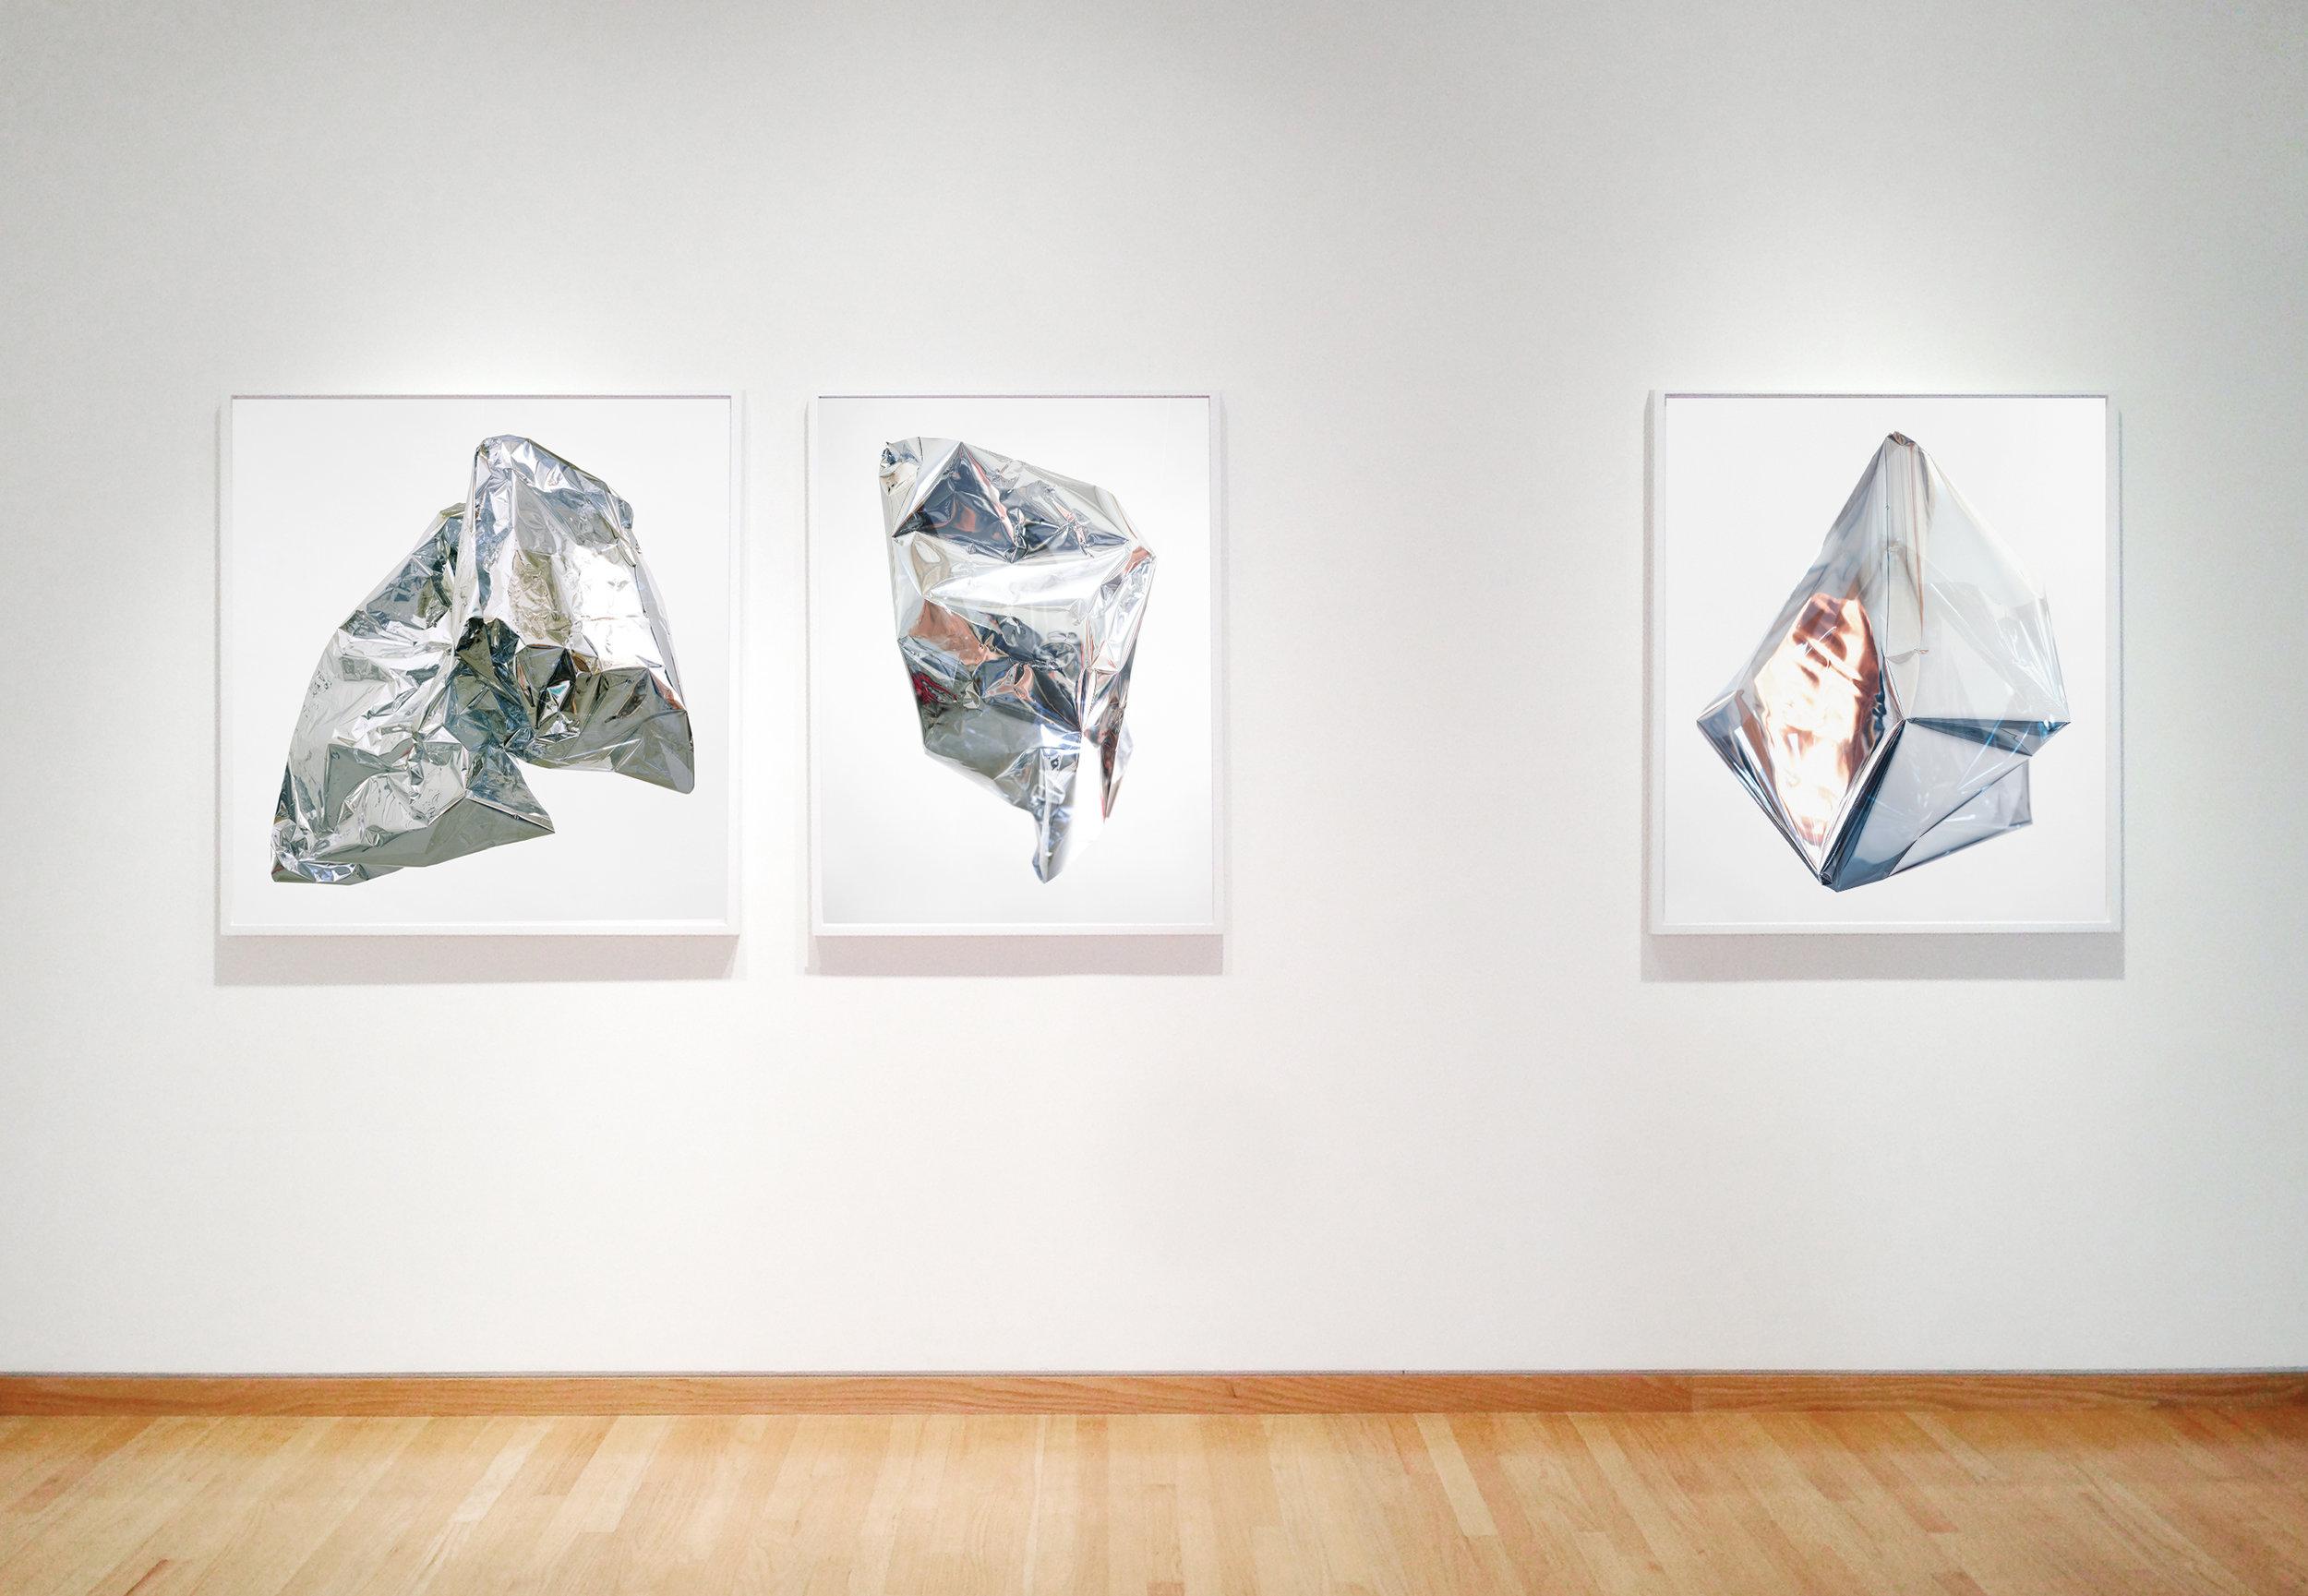 Luminous @ Stephen Wirtz Gallery 2013